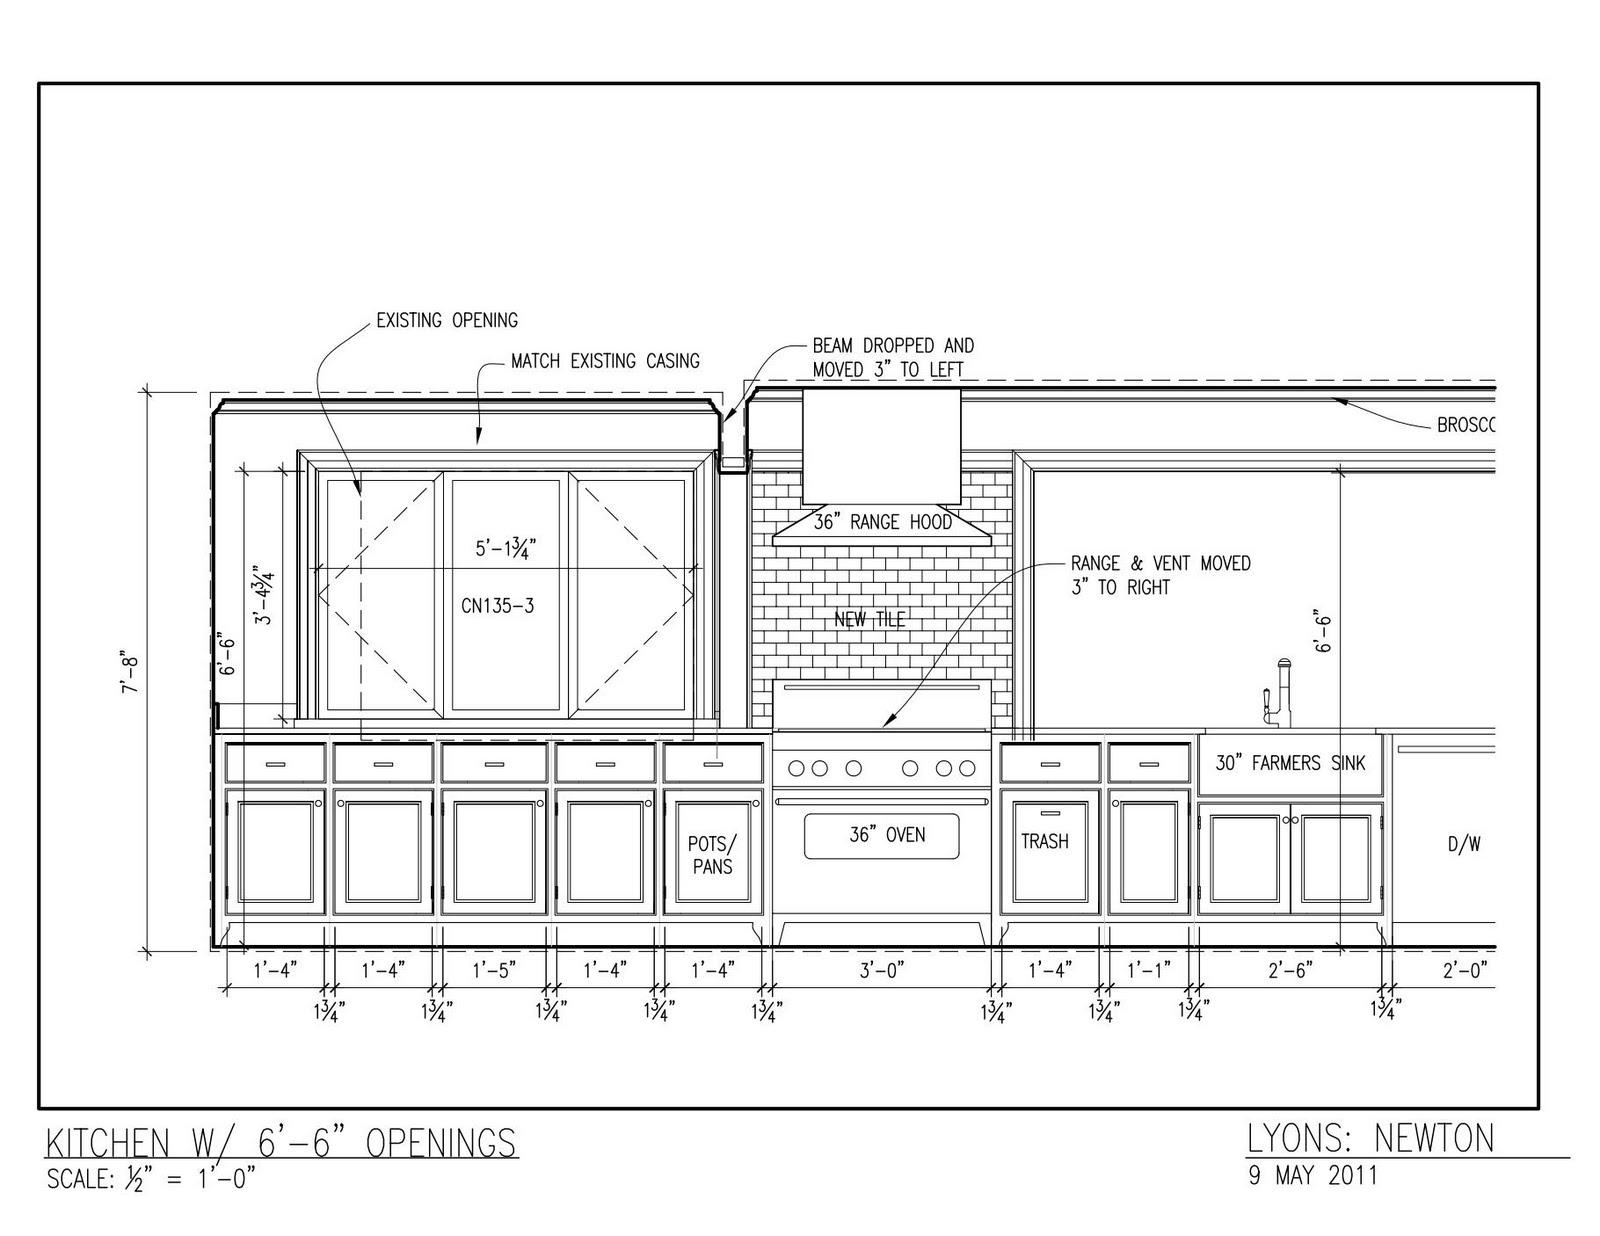 Kitchen Design Elevations the lyons renovation: kitchen elevation updated 5/9/11